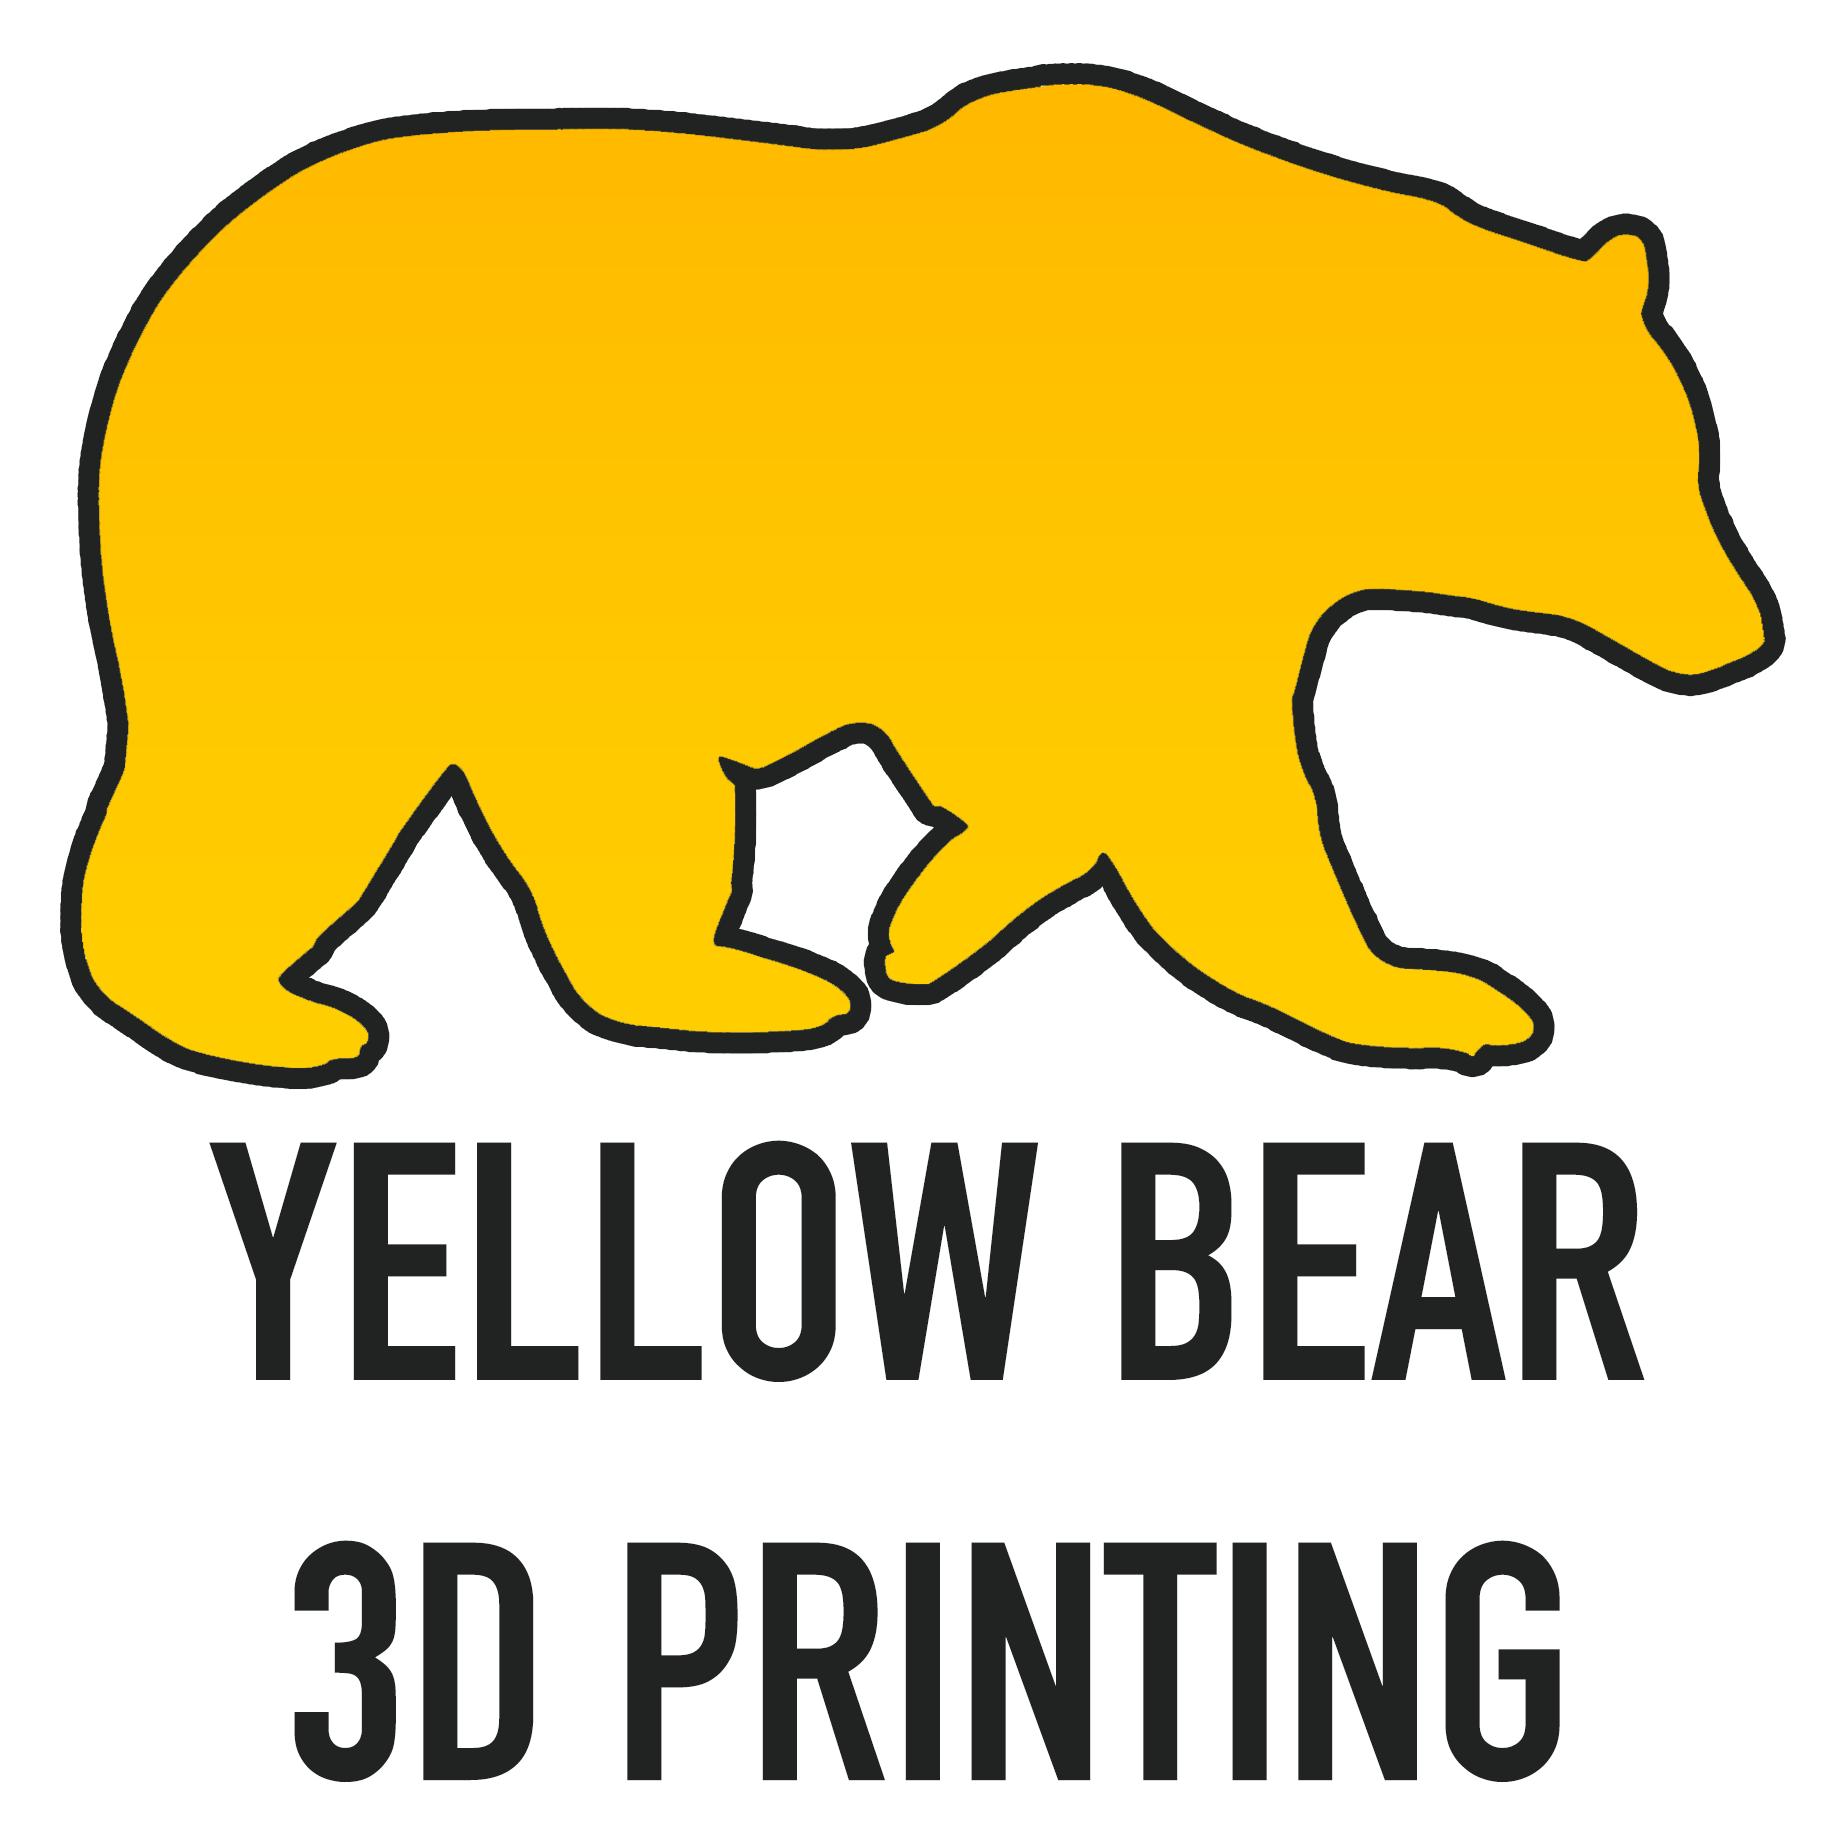 Yellow Bear 3D Printing